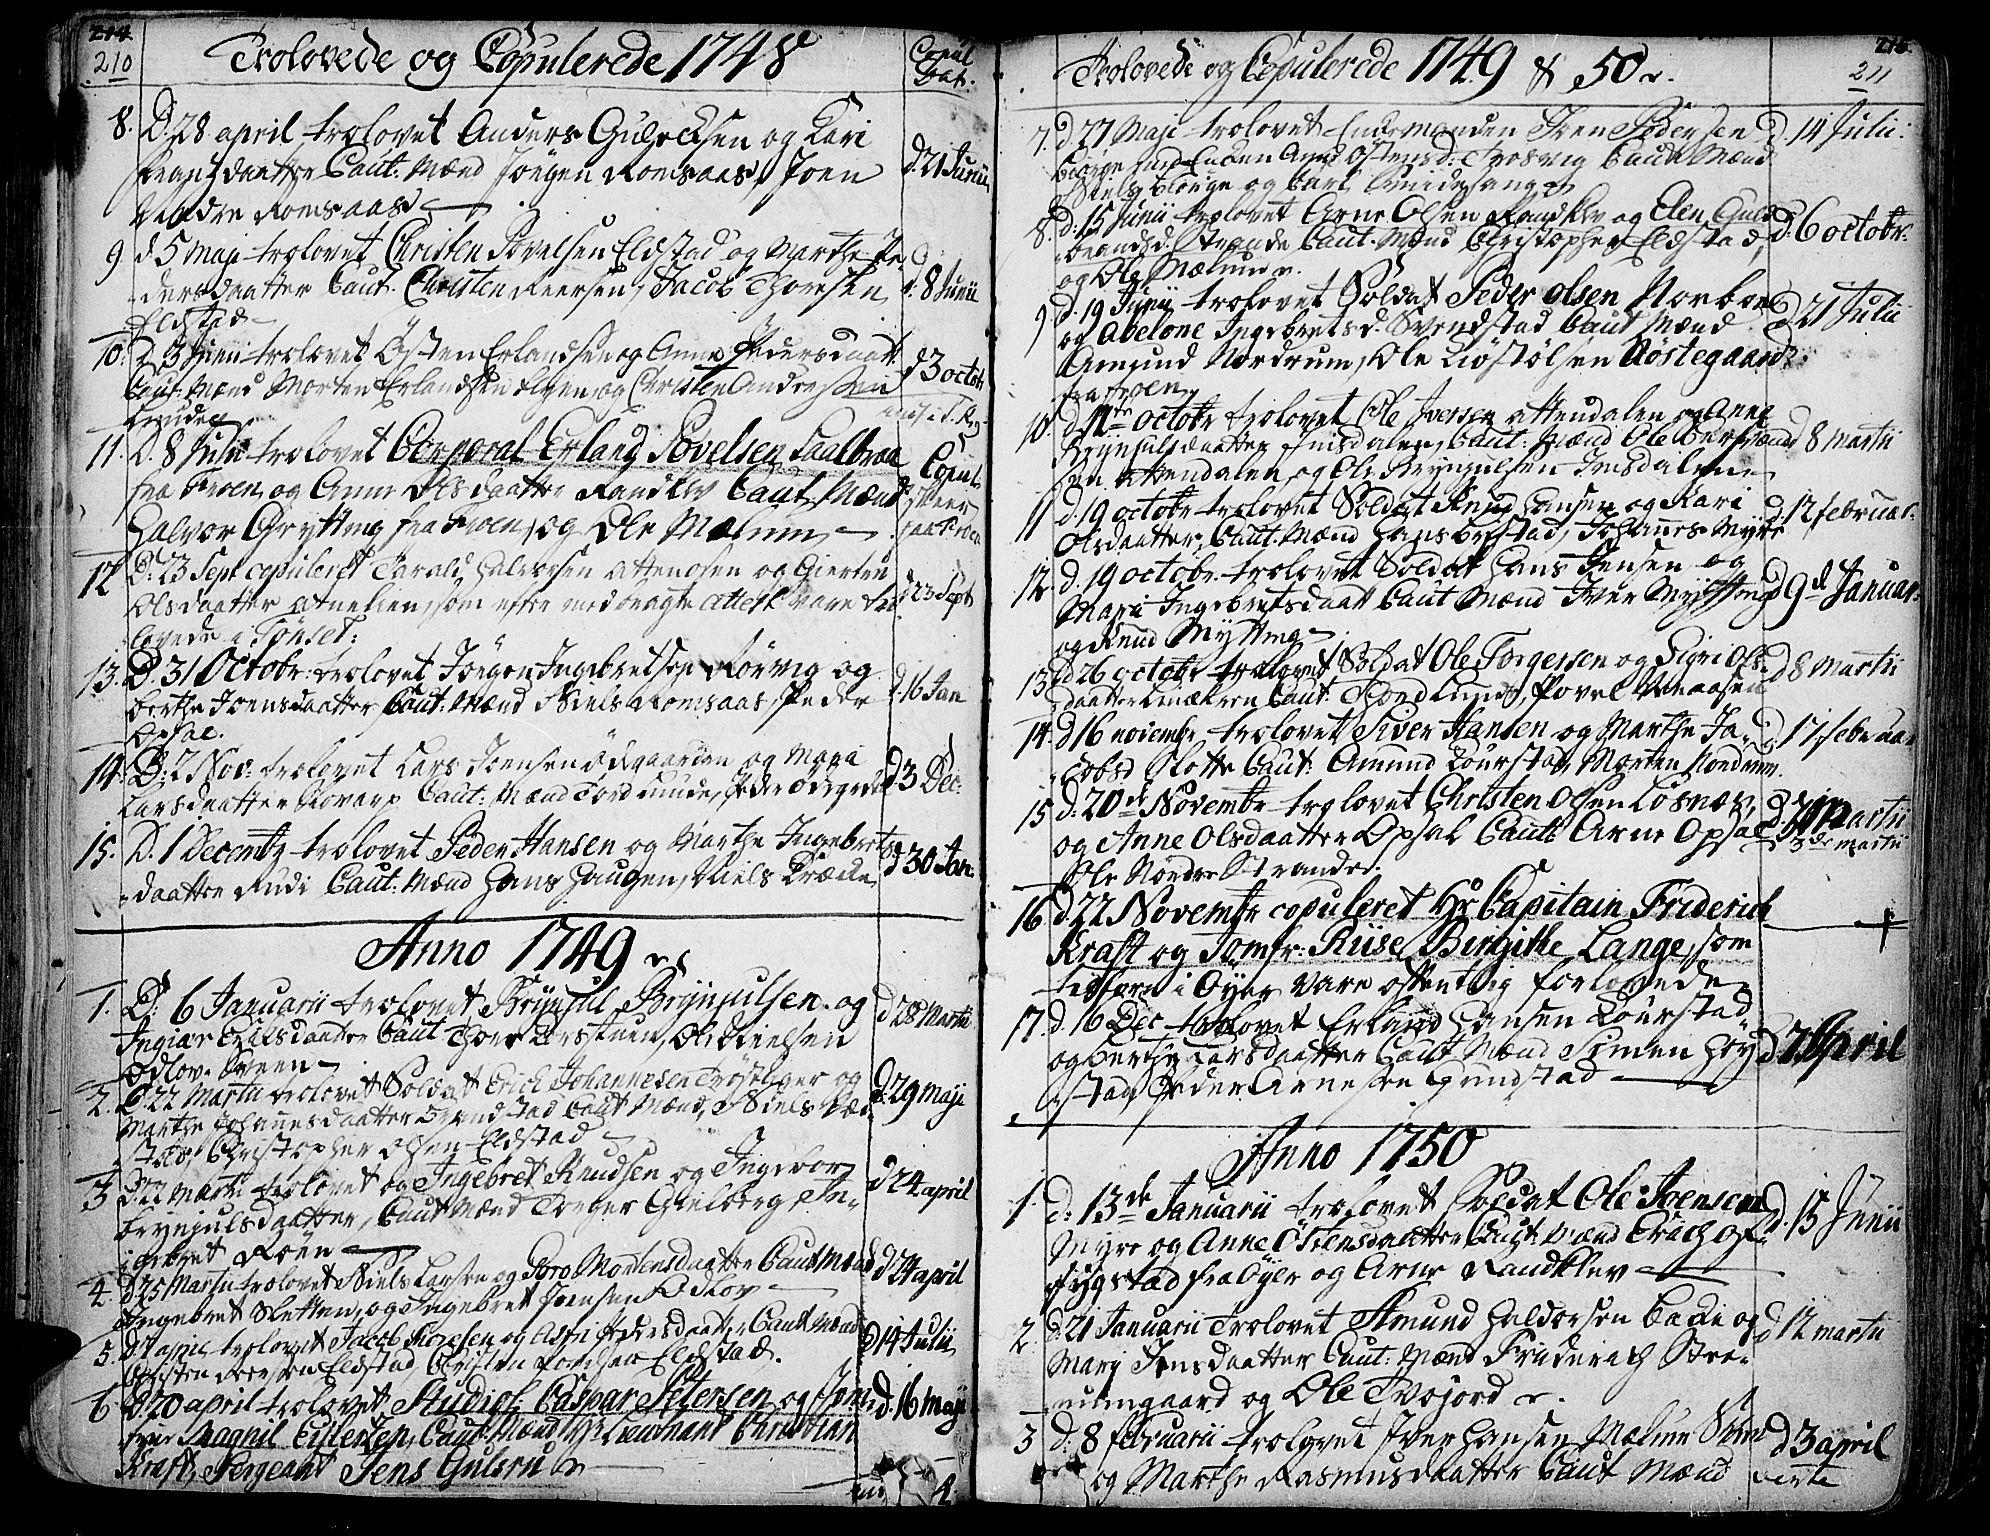 SAH, Ringebu prestekontor, Ministerialbok nr. 2, 1734-1780, s. 210-211